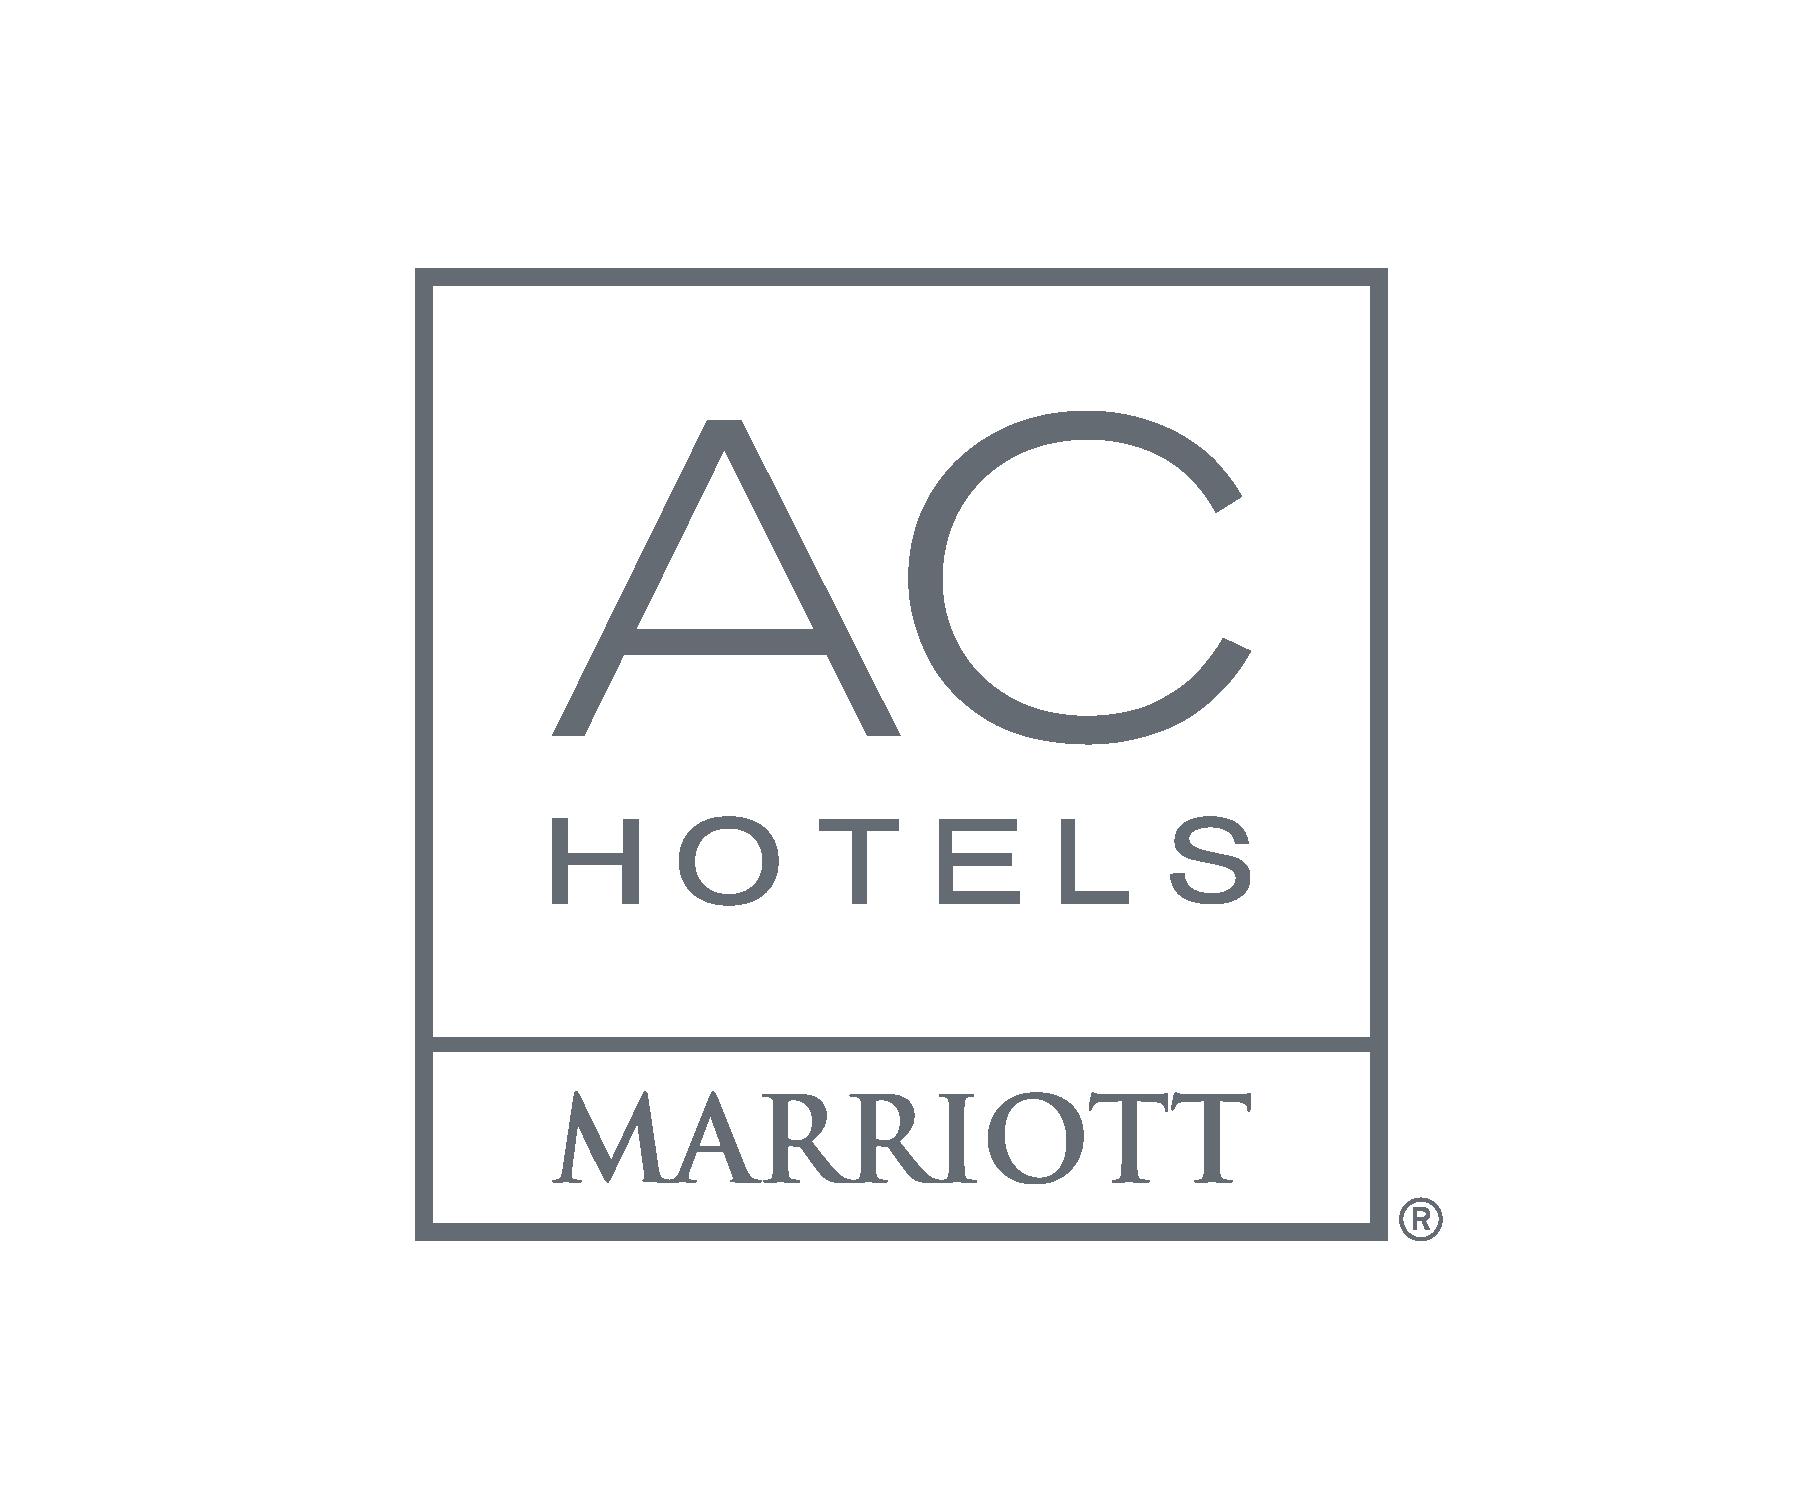 AC Hotels Marriott logo